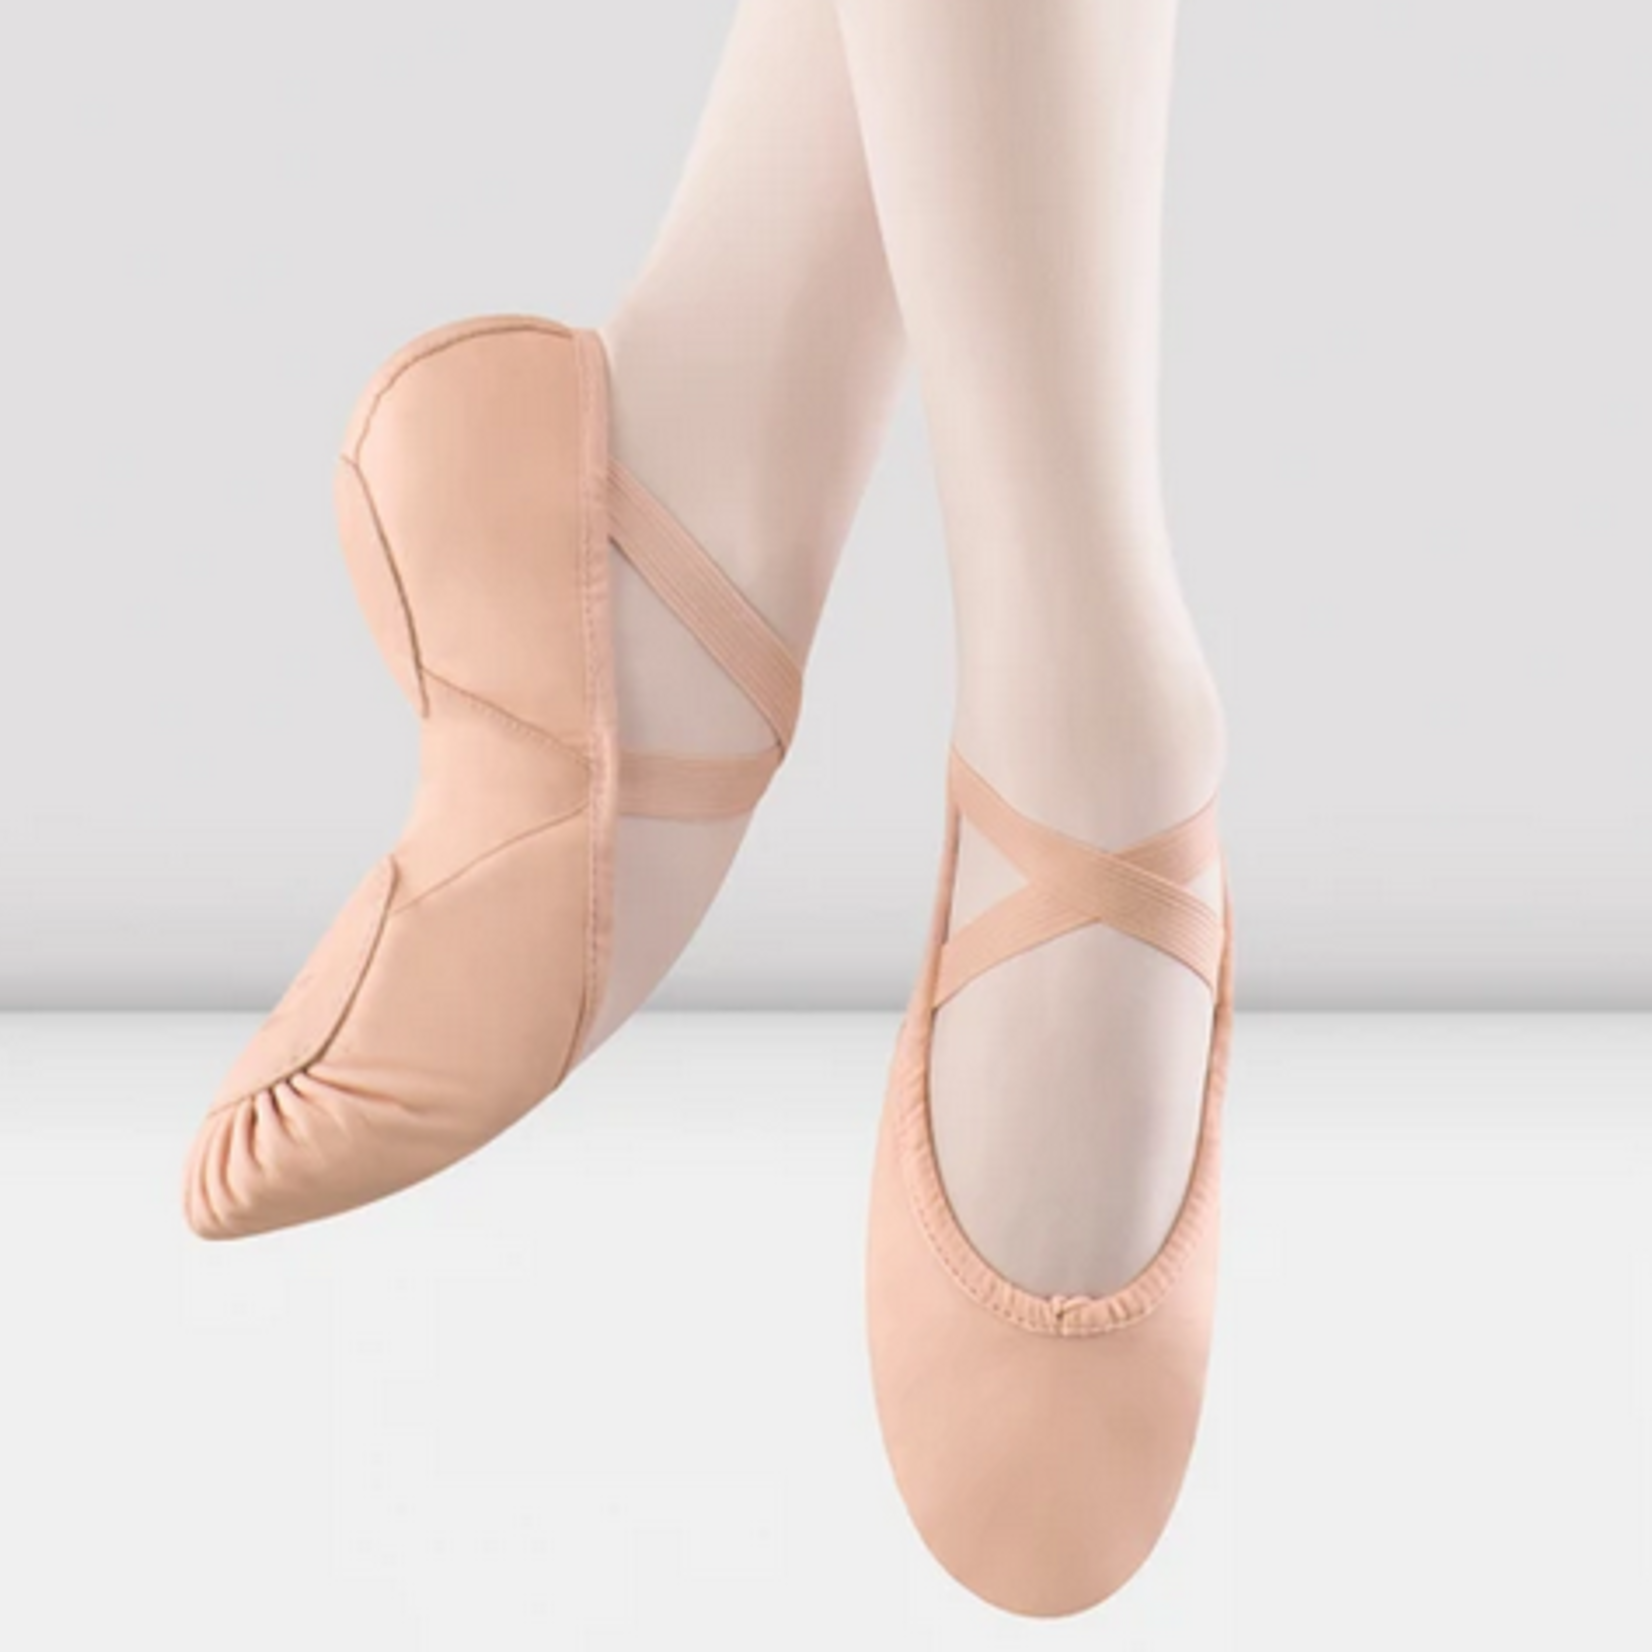 Bloch Bloch S0203G Prolite 2 Child Leather Ballet Shoe